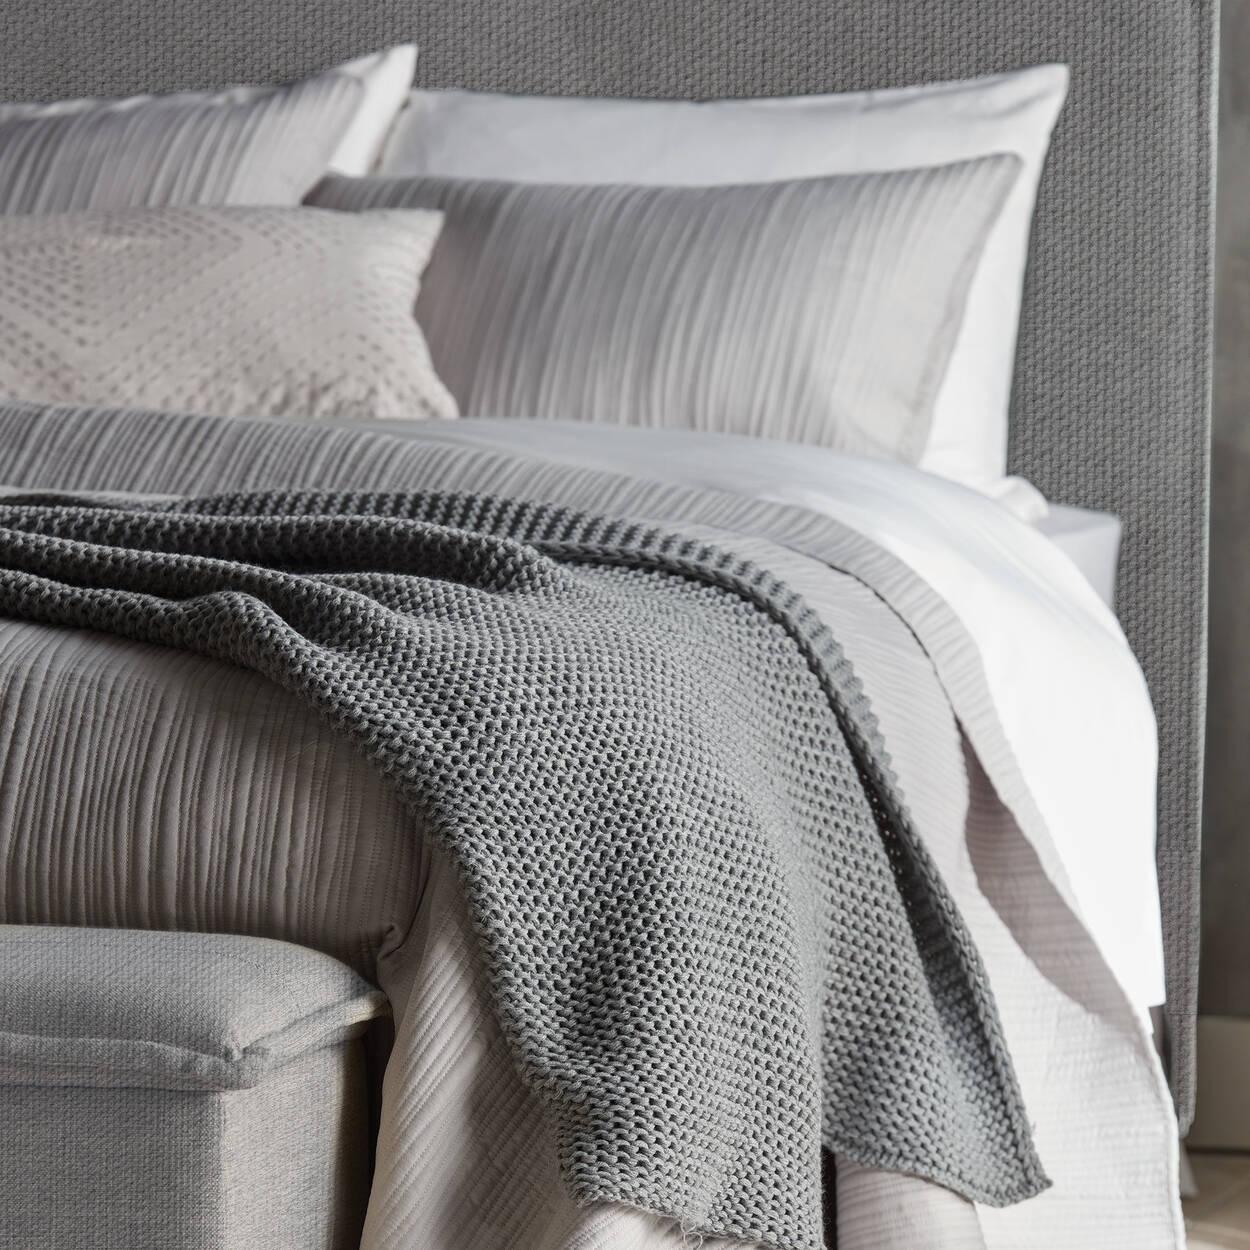 collection galway ensemble de couvre lit 3 pi ces. Black Bedroom Furniture Sets. Home Design Ideas